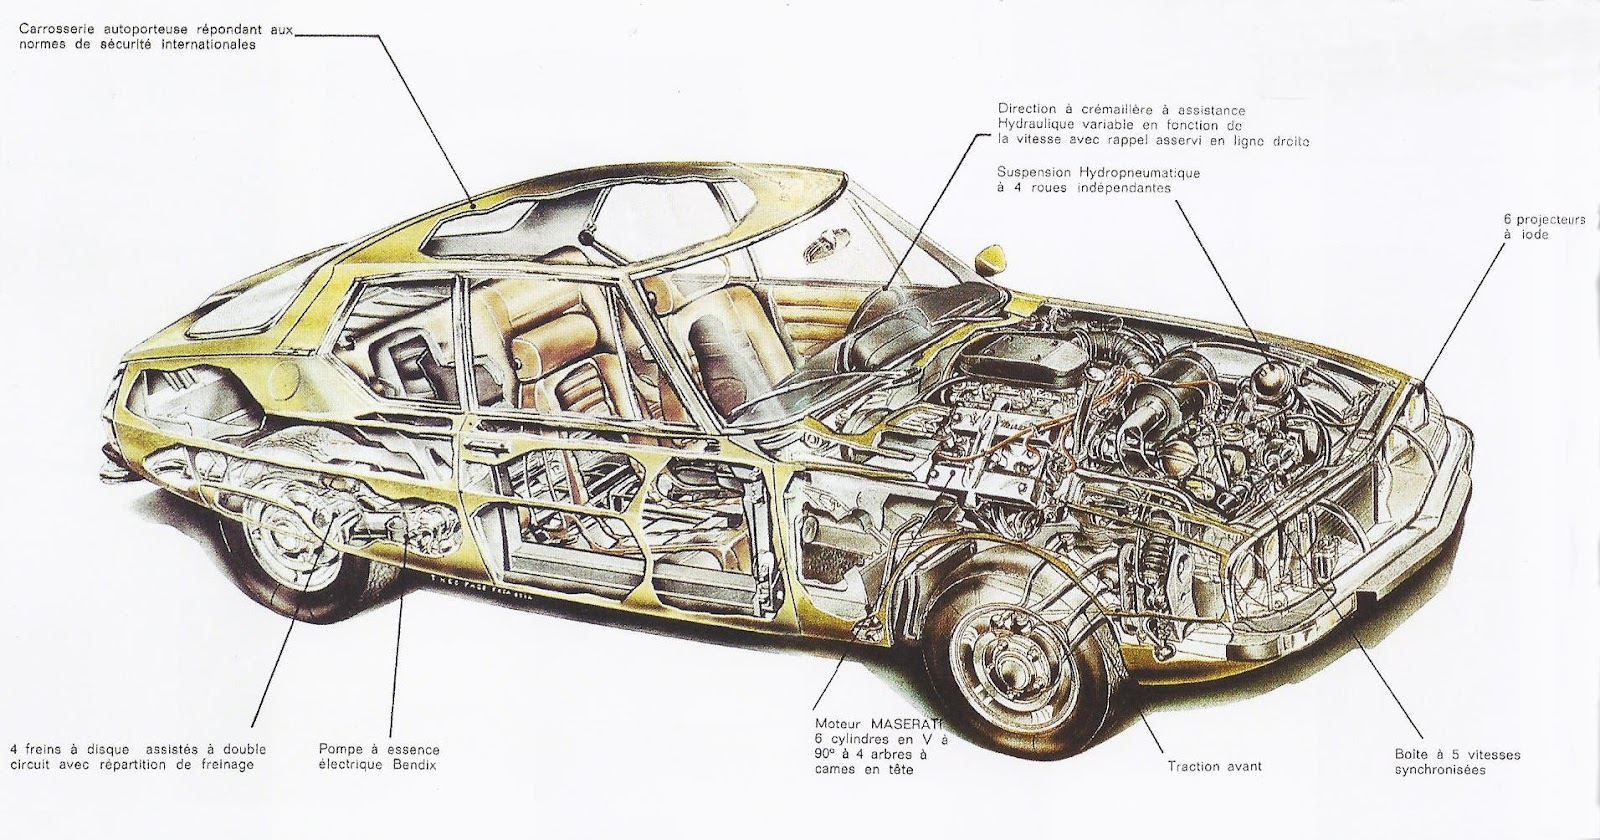 medium resolution of citroen sm cutaway diagrams the car hobby volkswagen w8 engine diagram